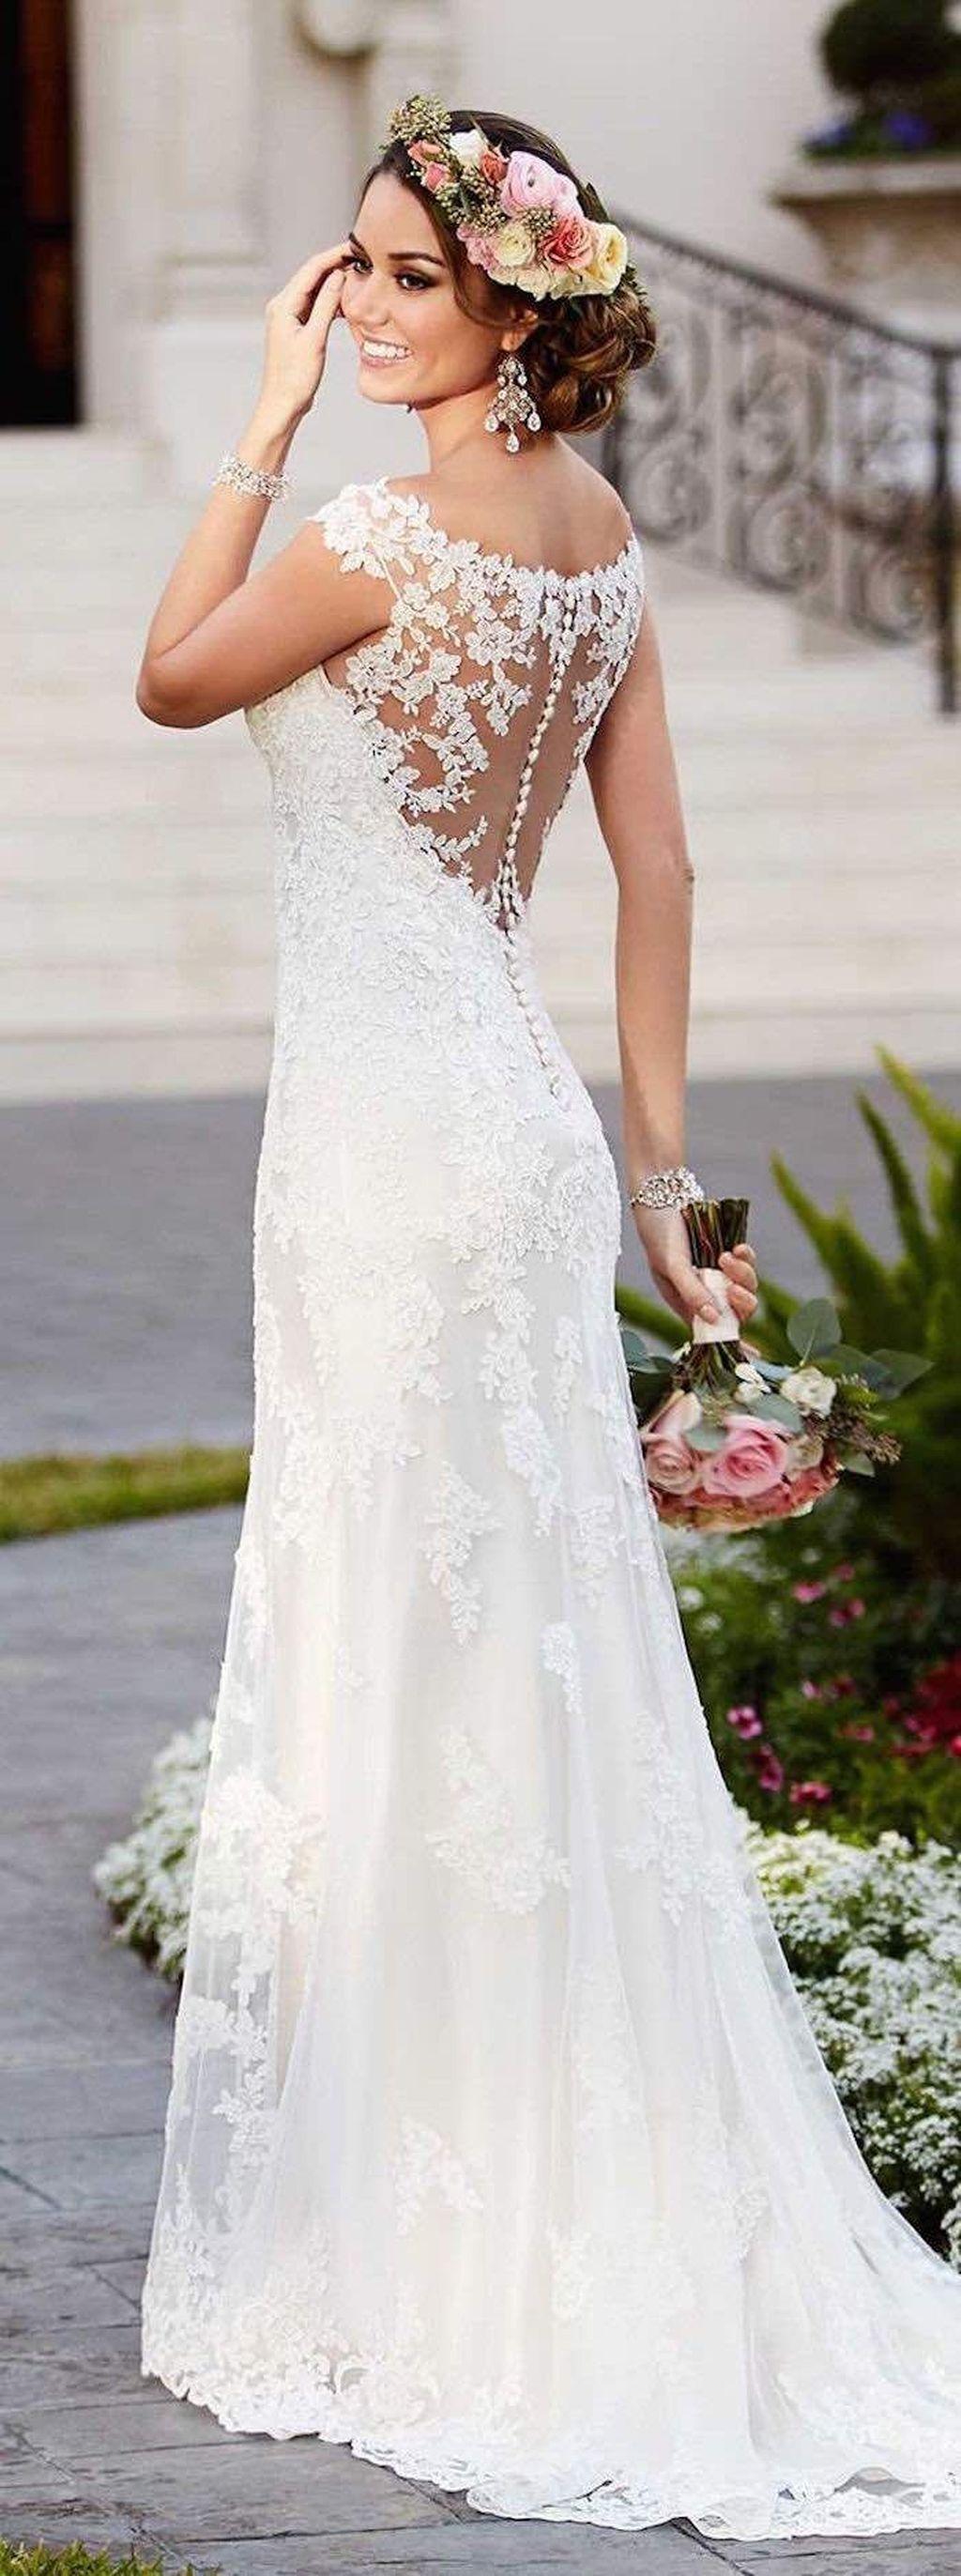 new spring and summer wedding dress trends ideas wedding